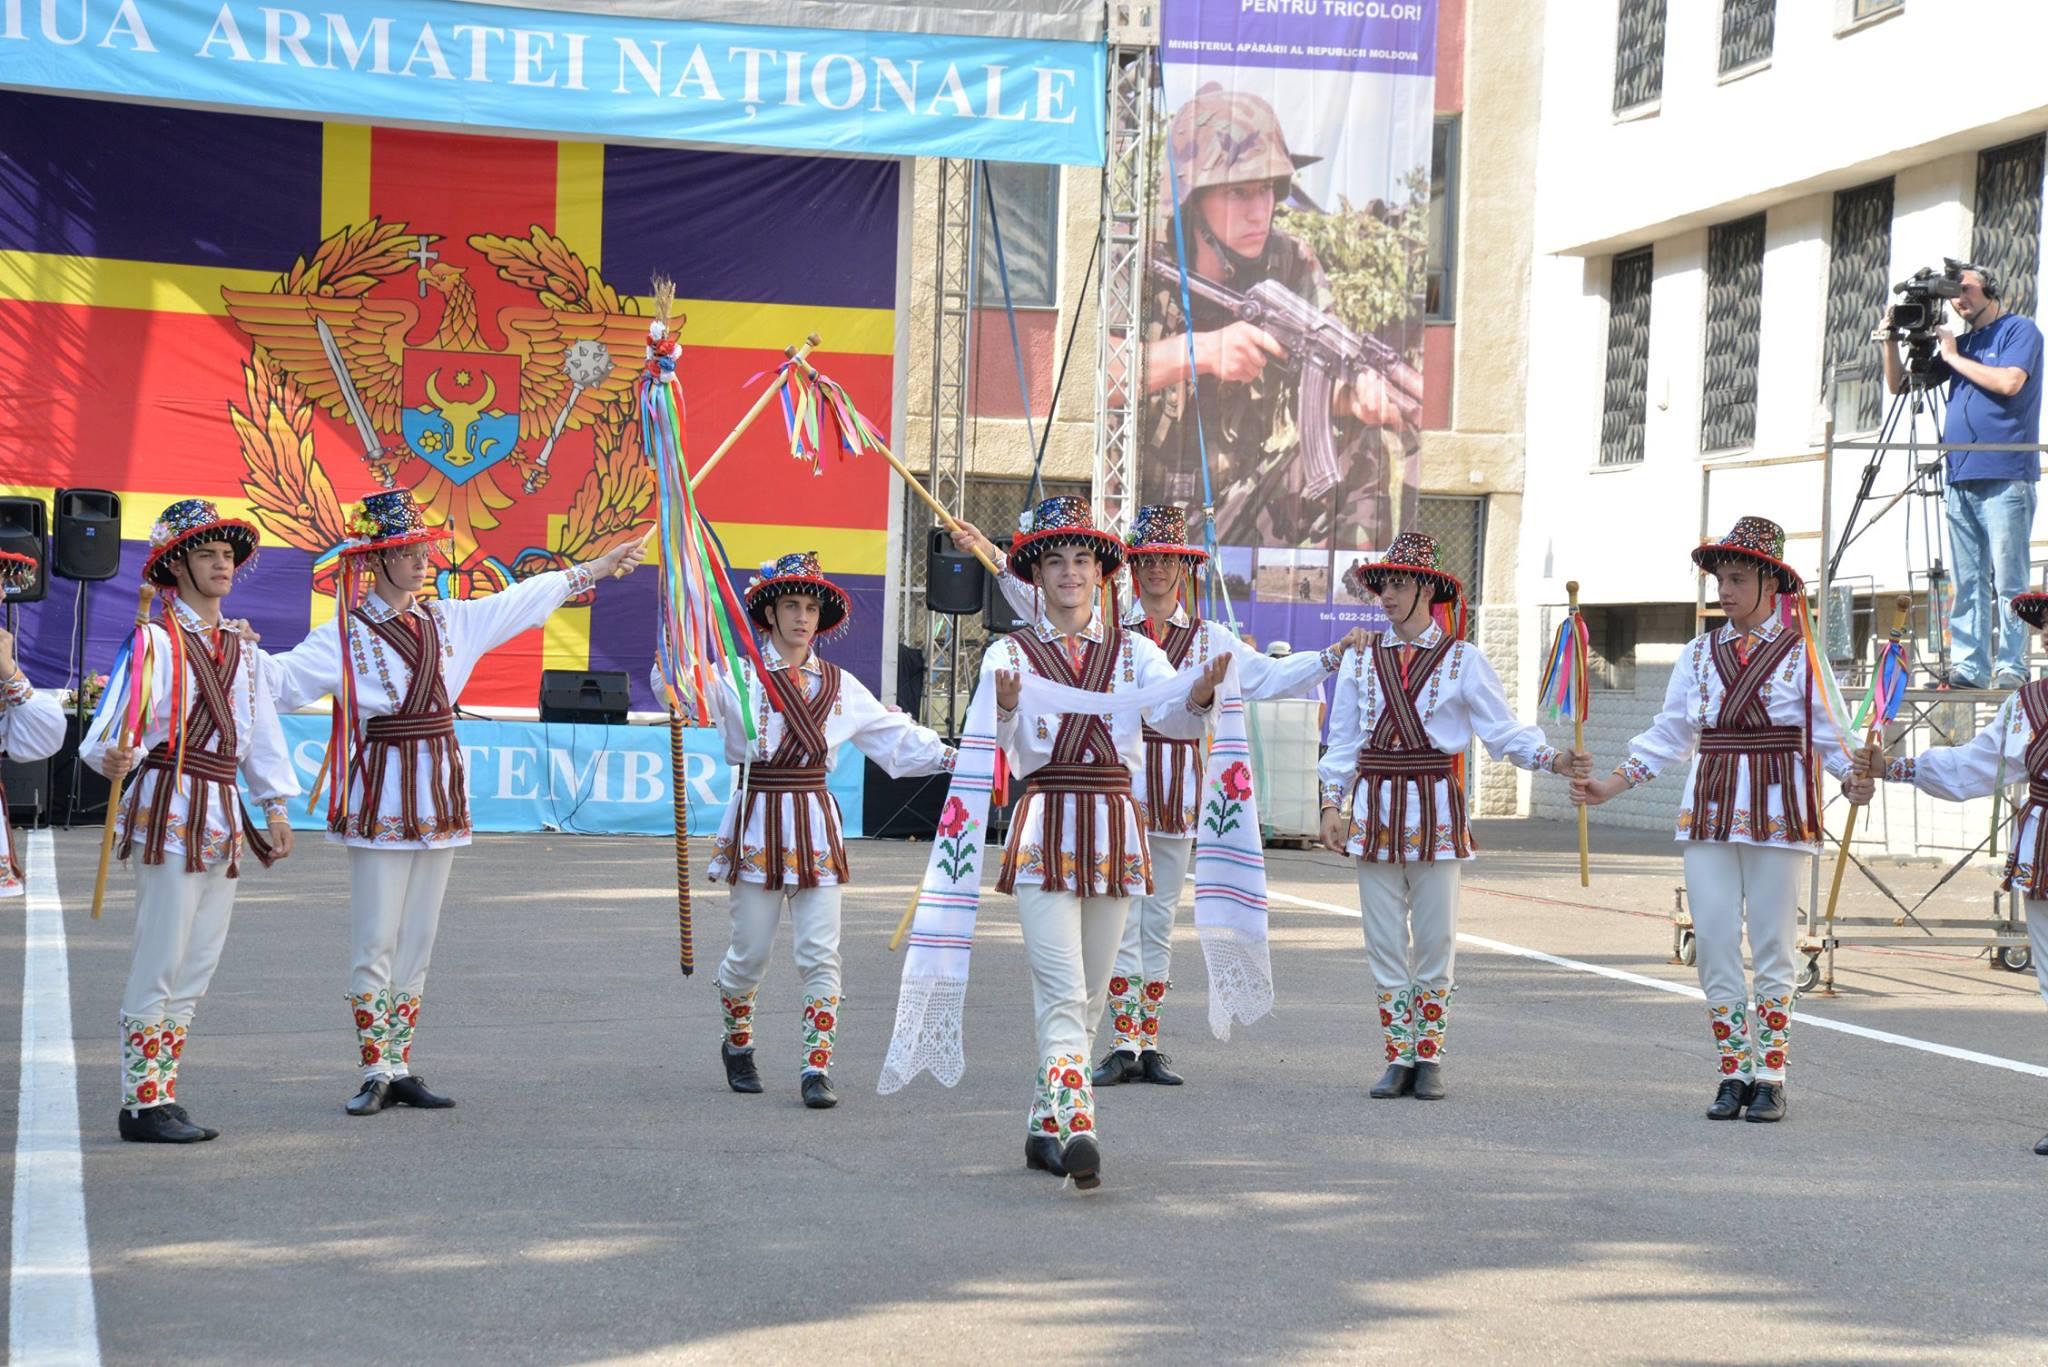 ce fac soldatii din moldova, armata rm, eugent sturza, guvernul filip,